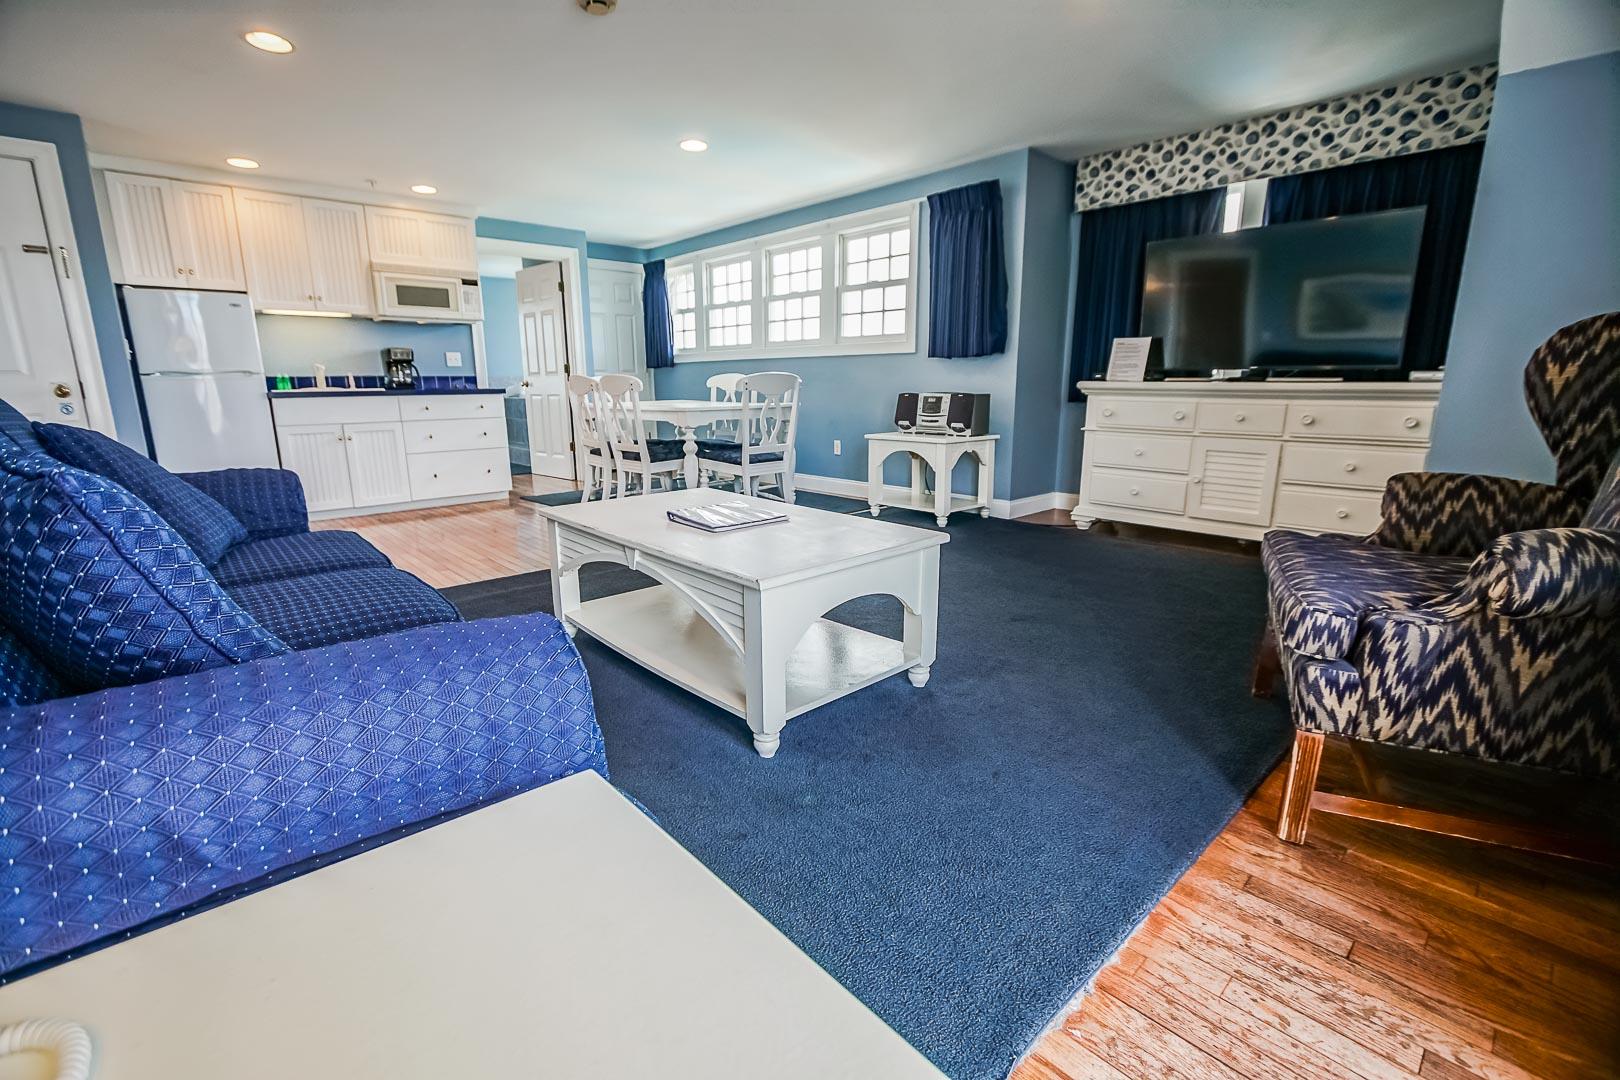 A spacious living room area at VRI's Beachside Village Resort in Massachusetts.